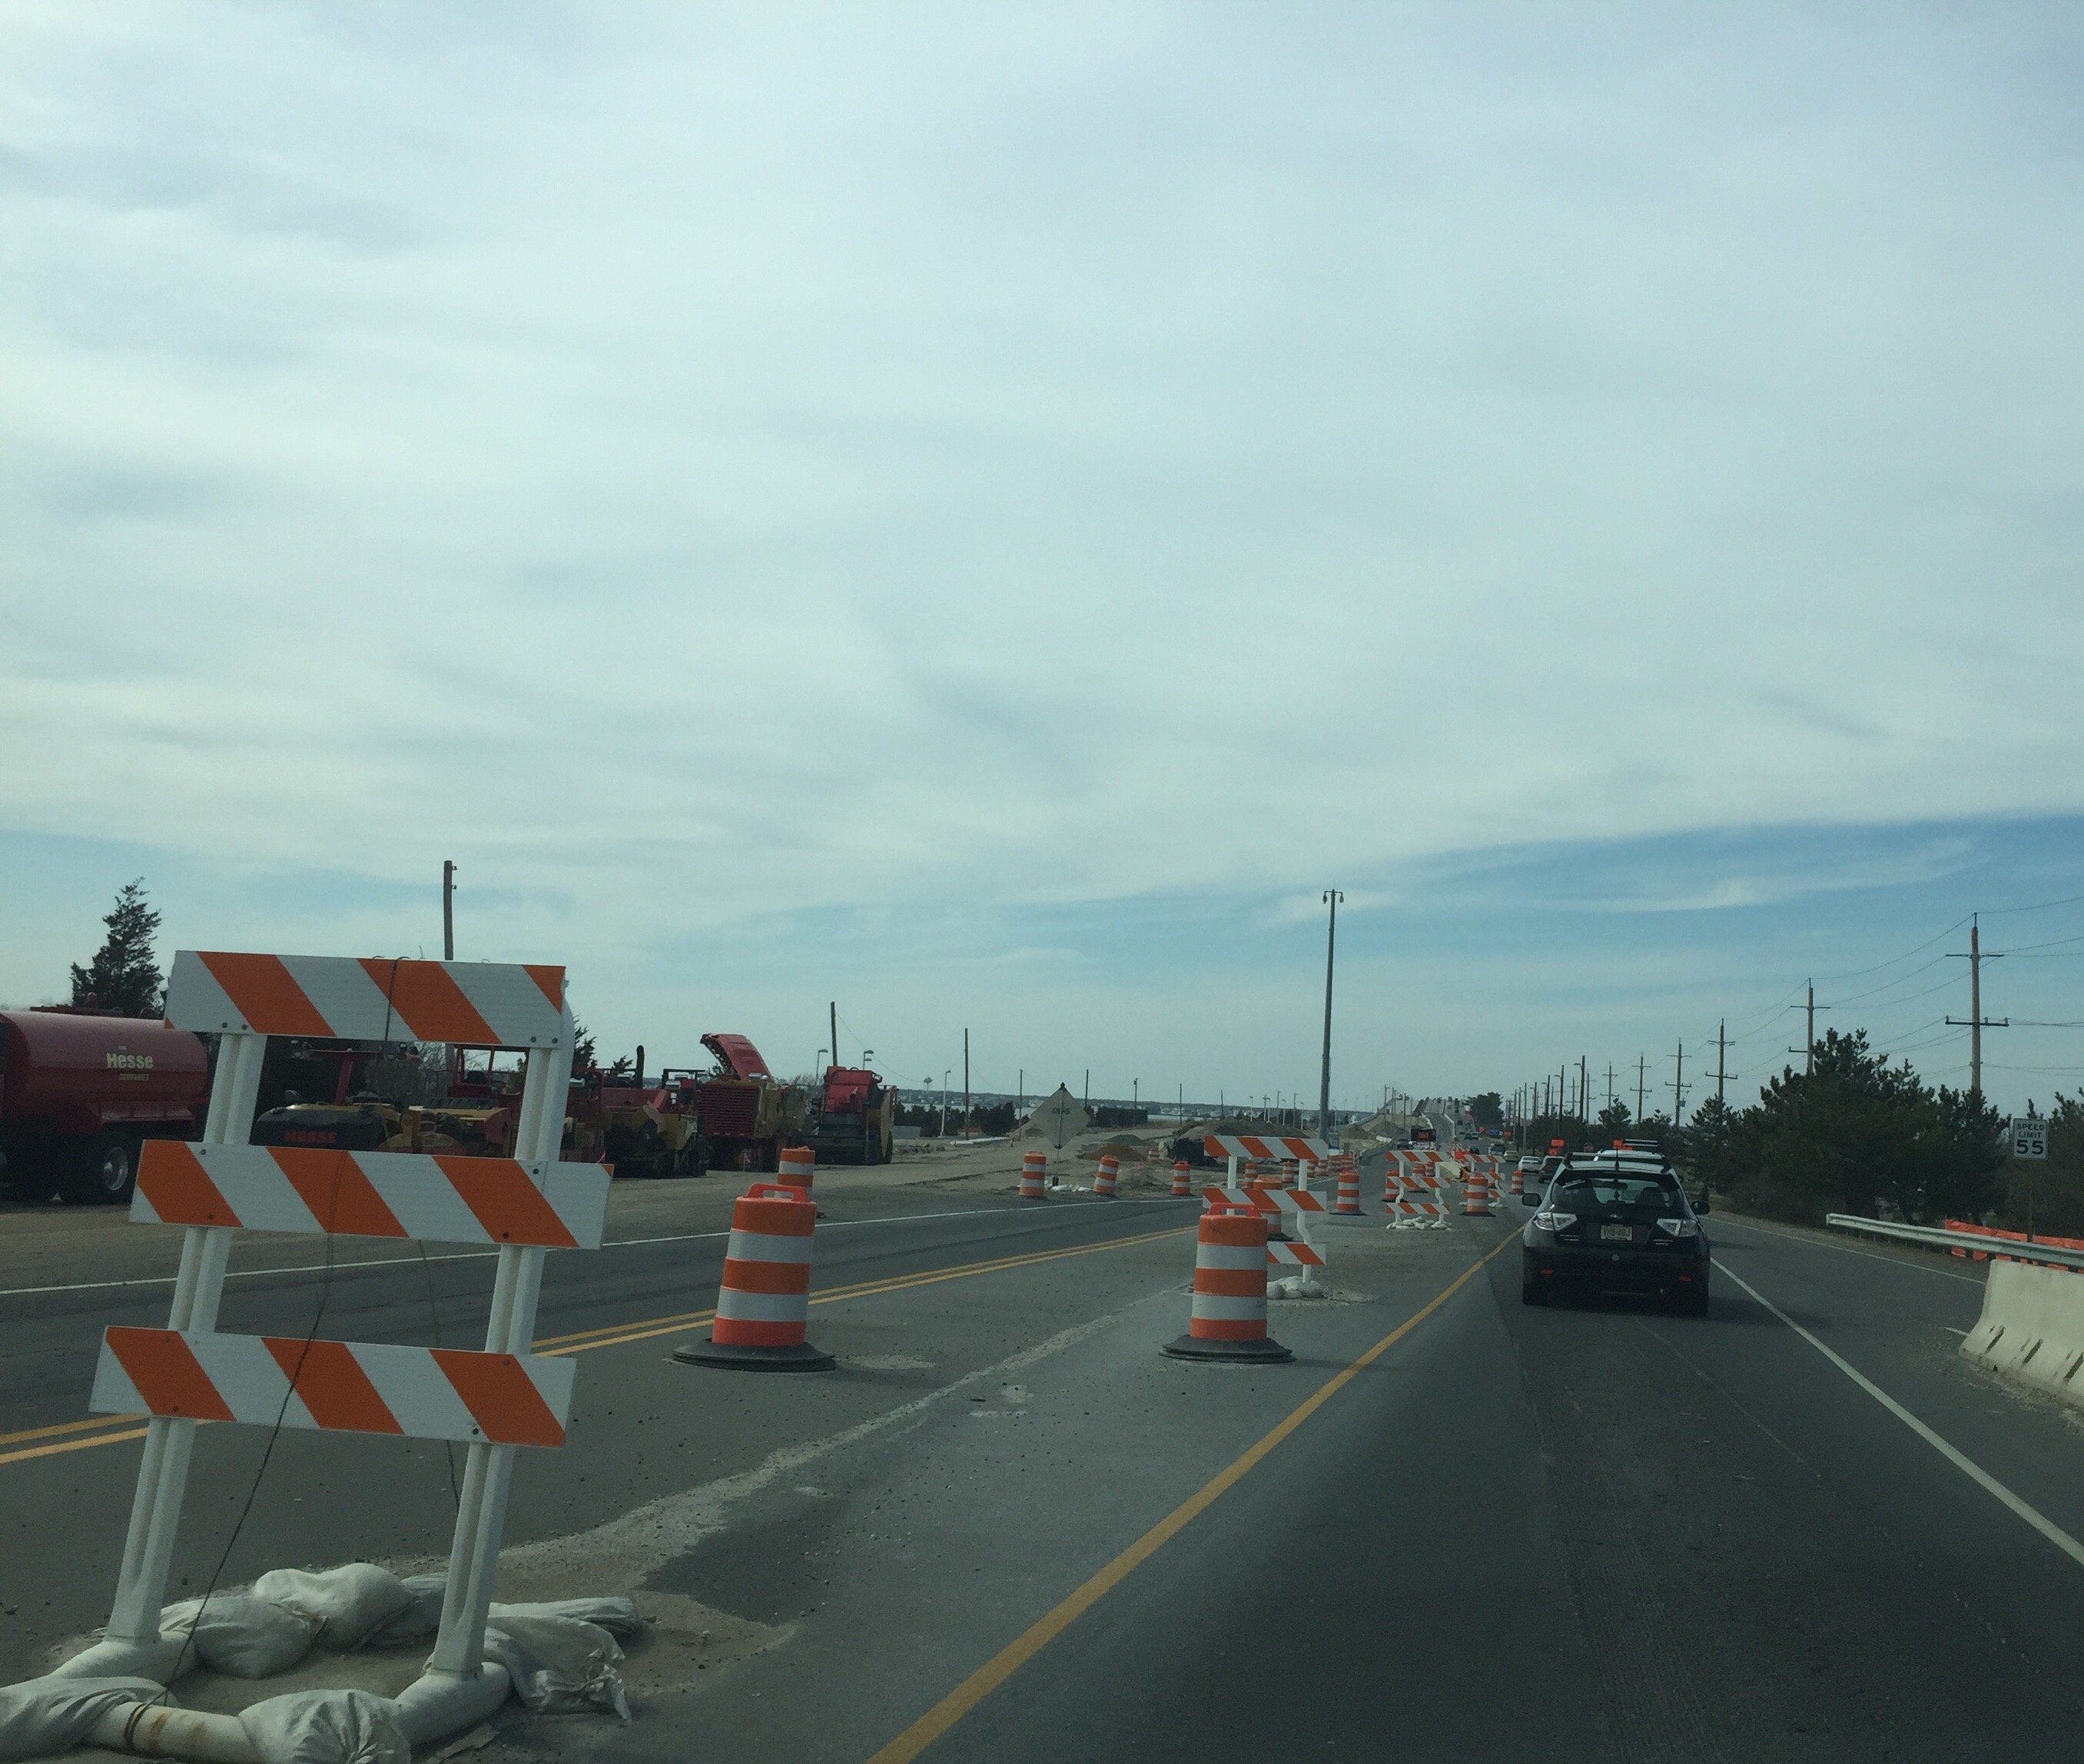 Lbi Nj: The Latest Manahawkin Bay Bridge Project Update